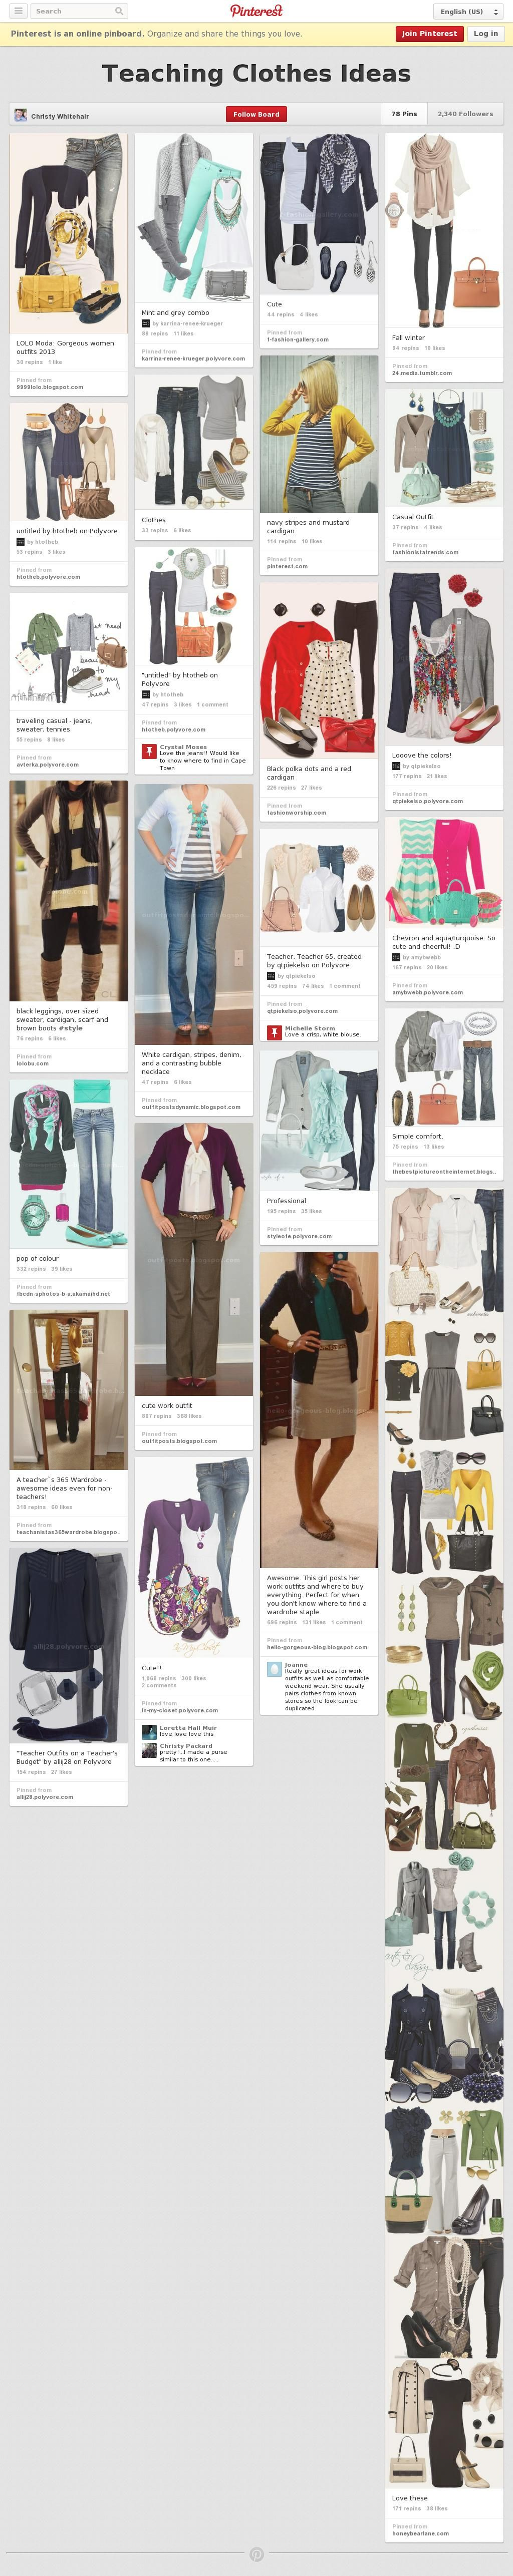 Teaching Clothes Ideas - Pinterest Board